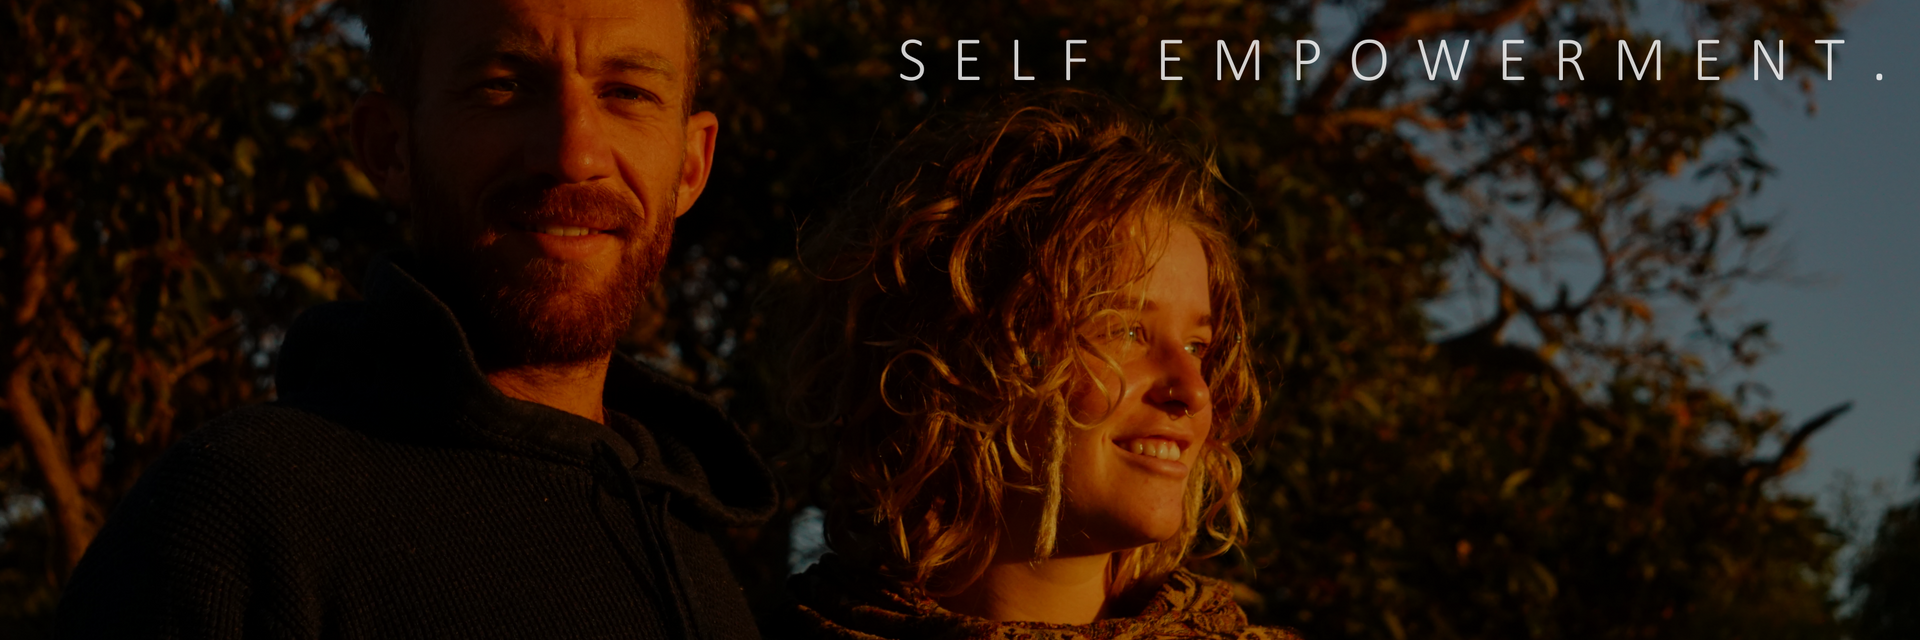 self empowerment.png